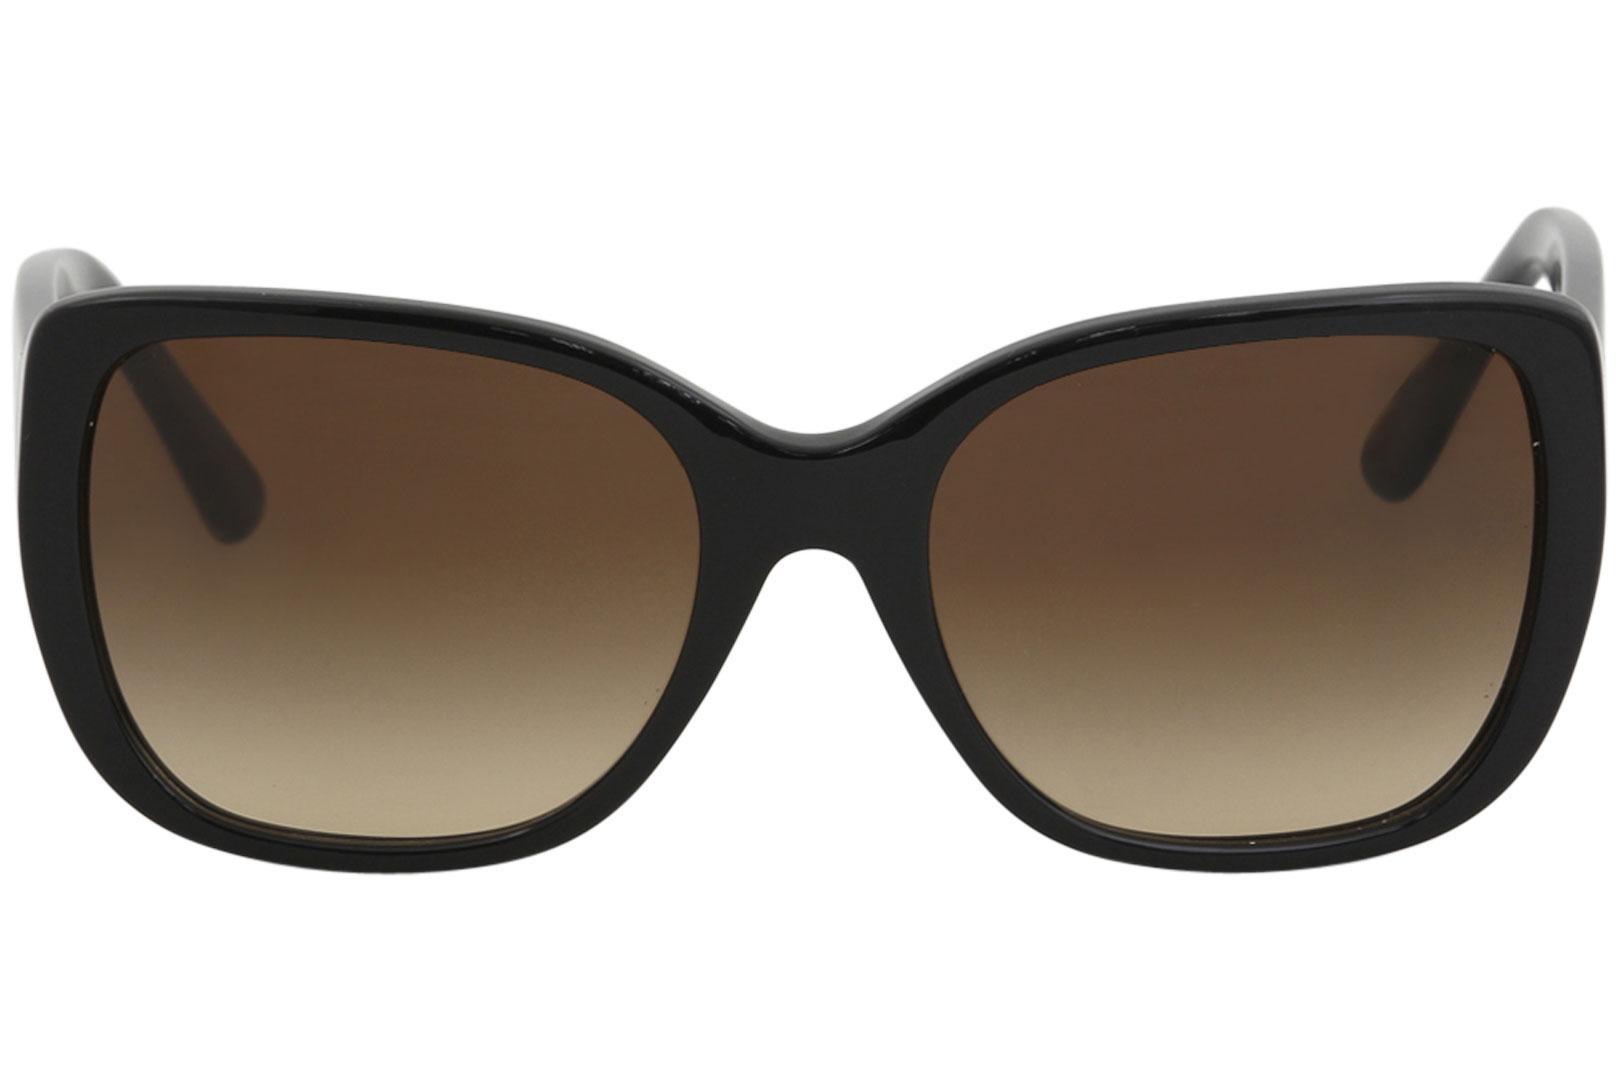 d9dbd654530b Tory Burch Women's TY7086 TY/7086 Fashion Square Sunglasses